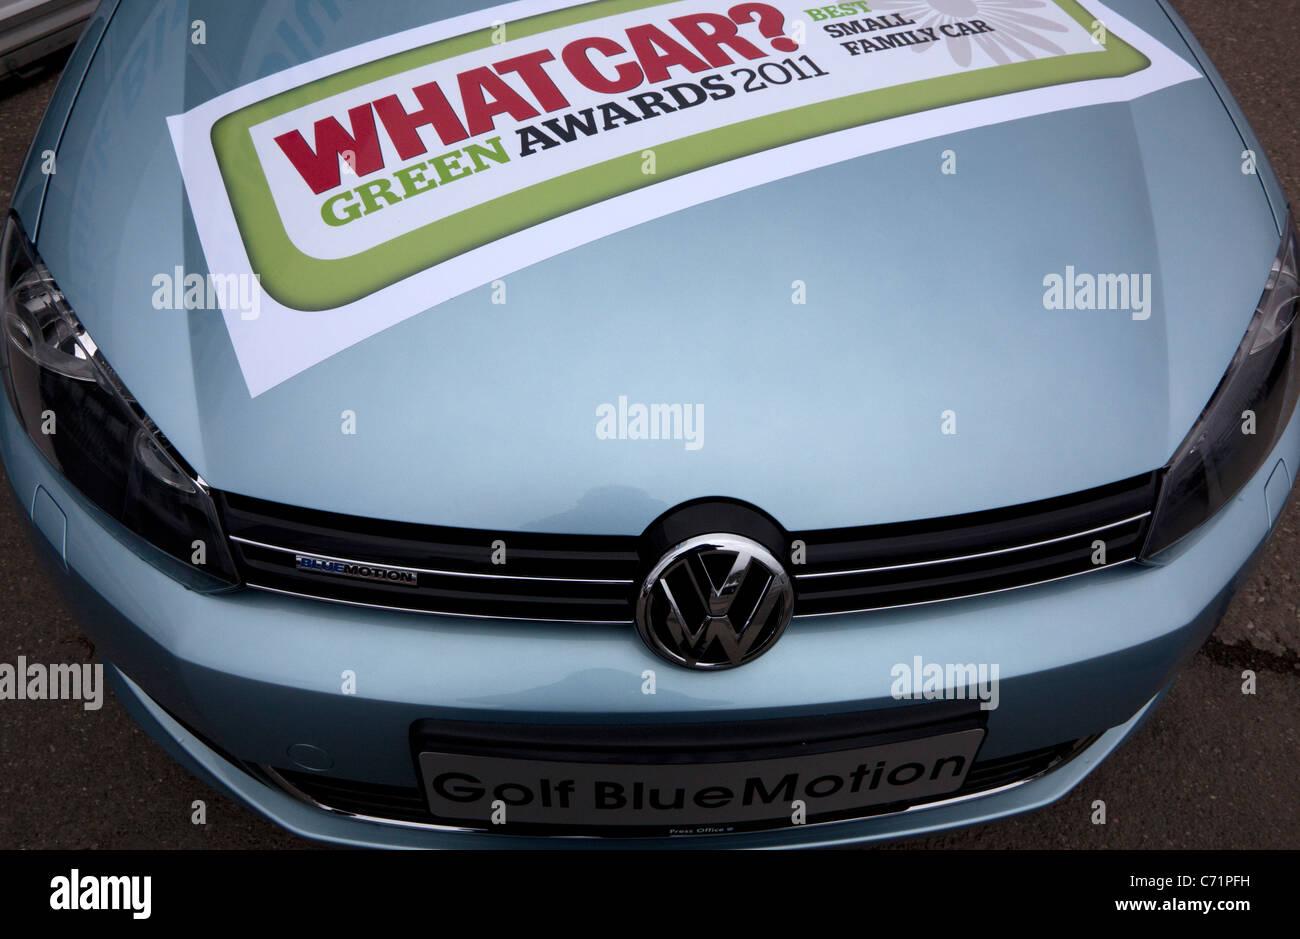 Ecovelocity motor festival London - Volkswagen Golf Blue Motion - Stock Image